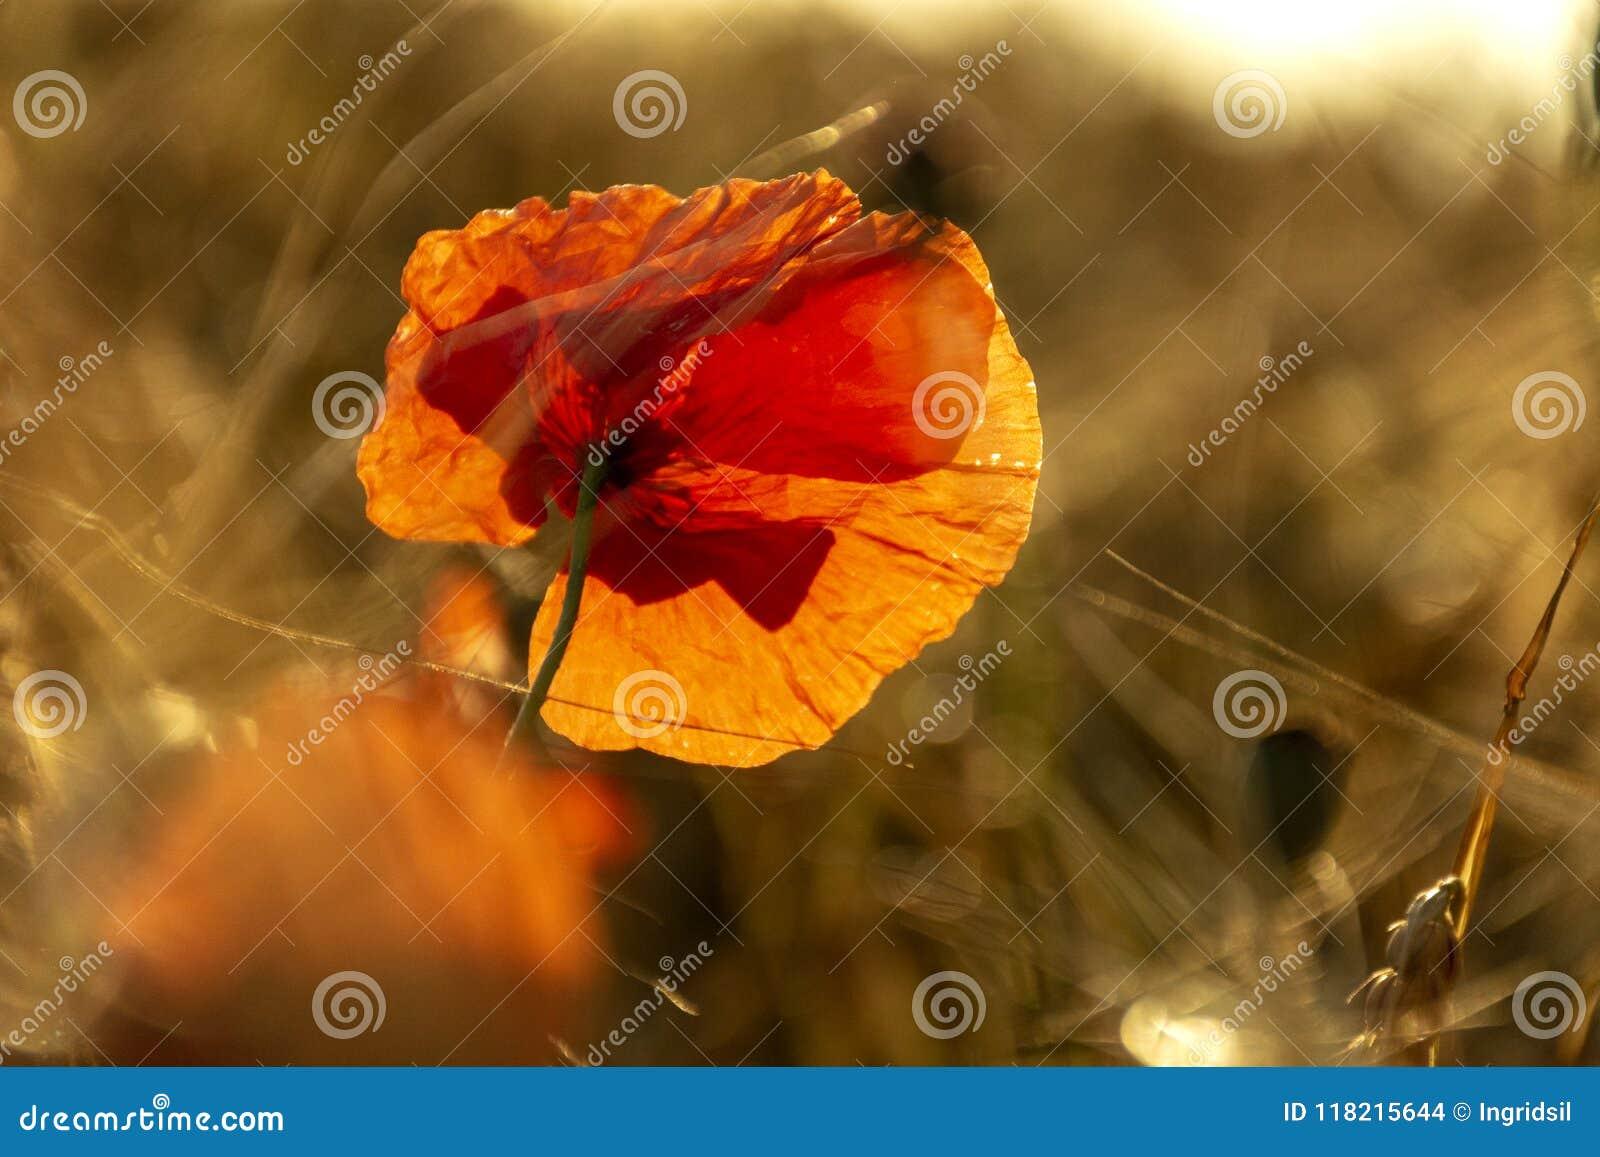 Rote Mohnblumenblume in ein Weizenfeld bei Sonnenuntergang Frühling speak